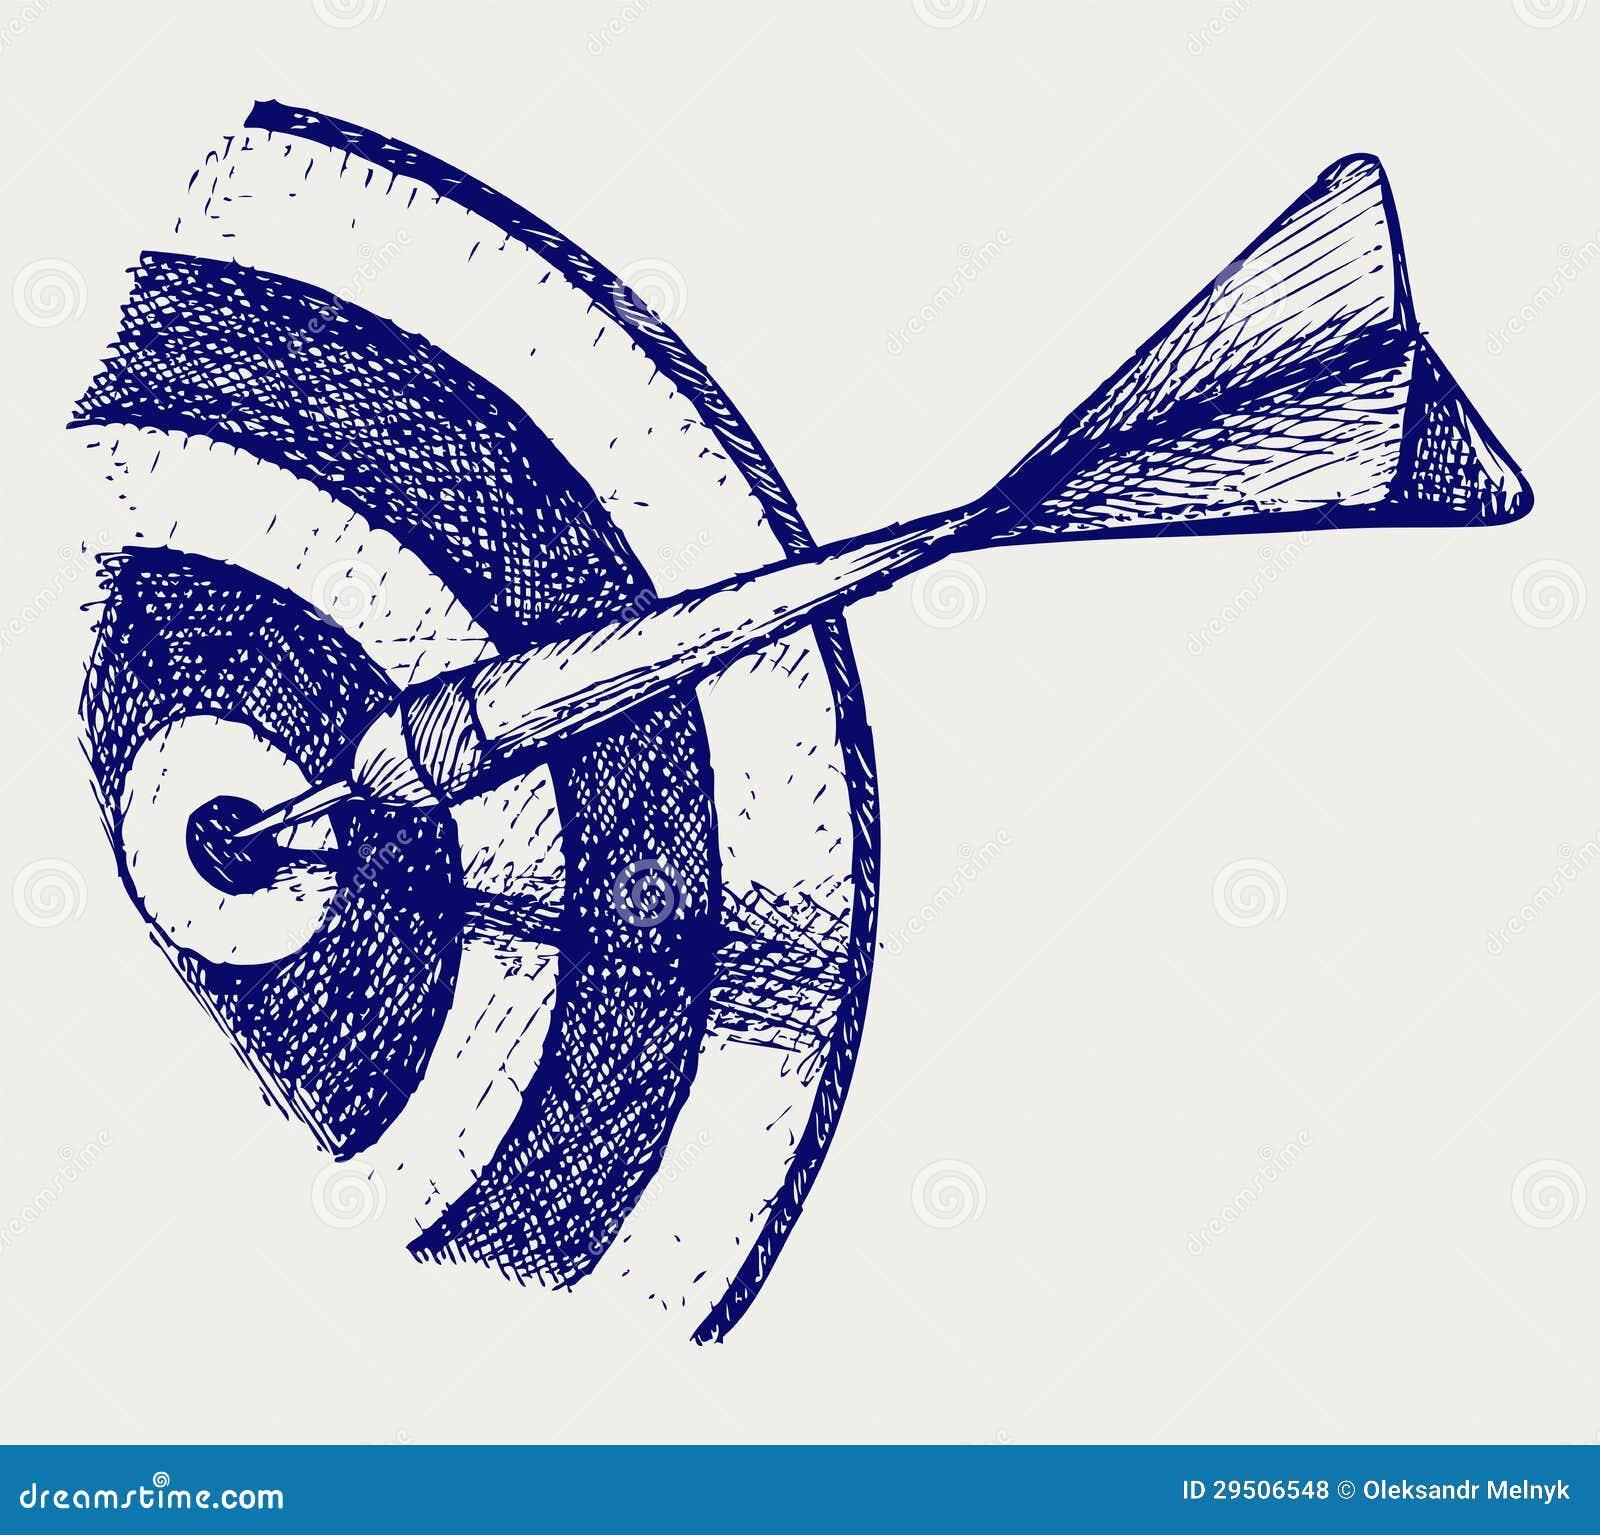 Drawing human ear royalty free stock photography image 25570937 - Arrow In Target Royalty Free Stock Photos